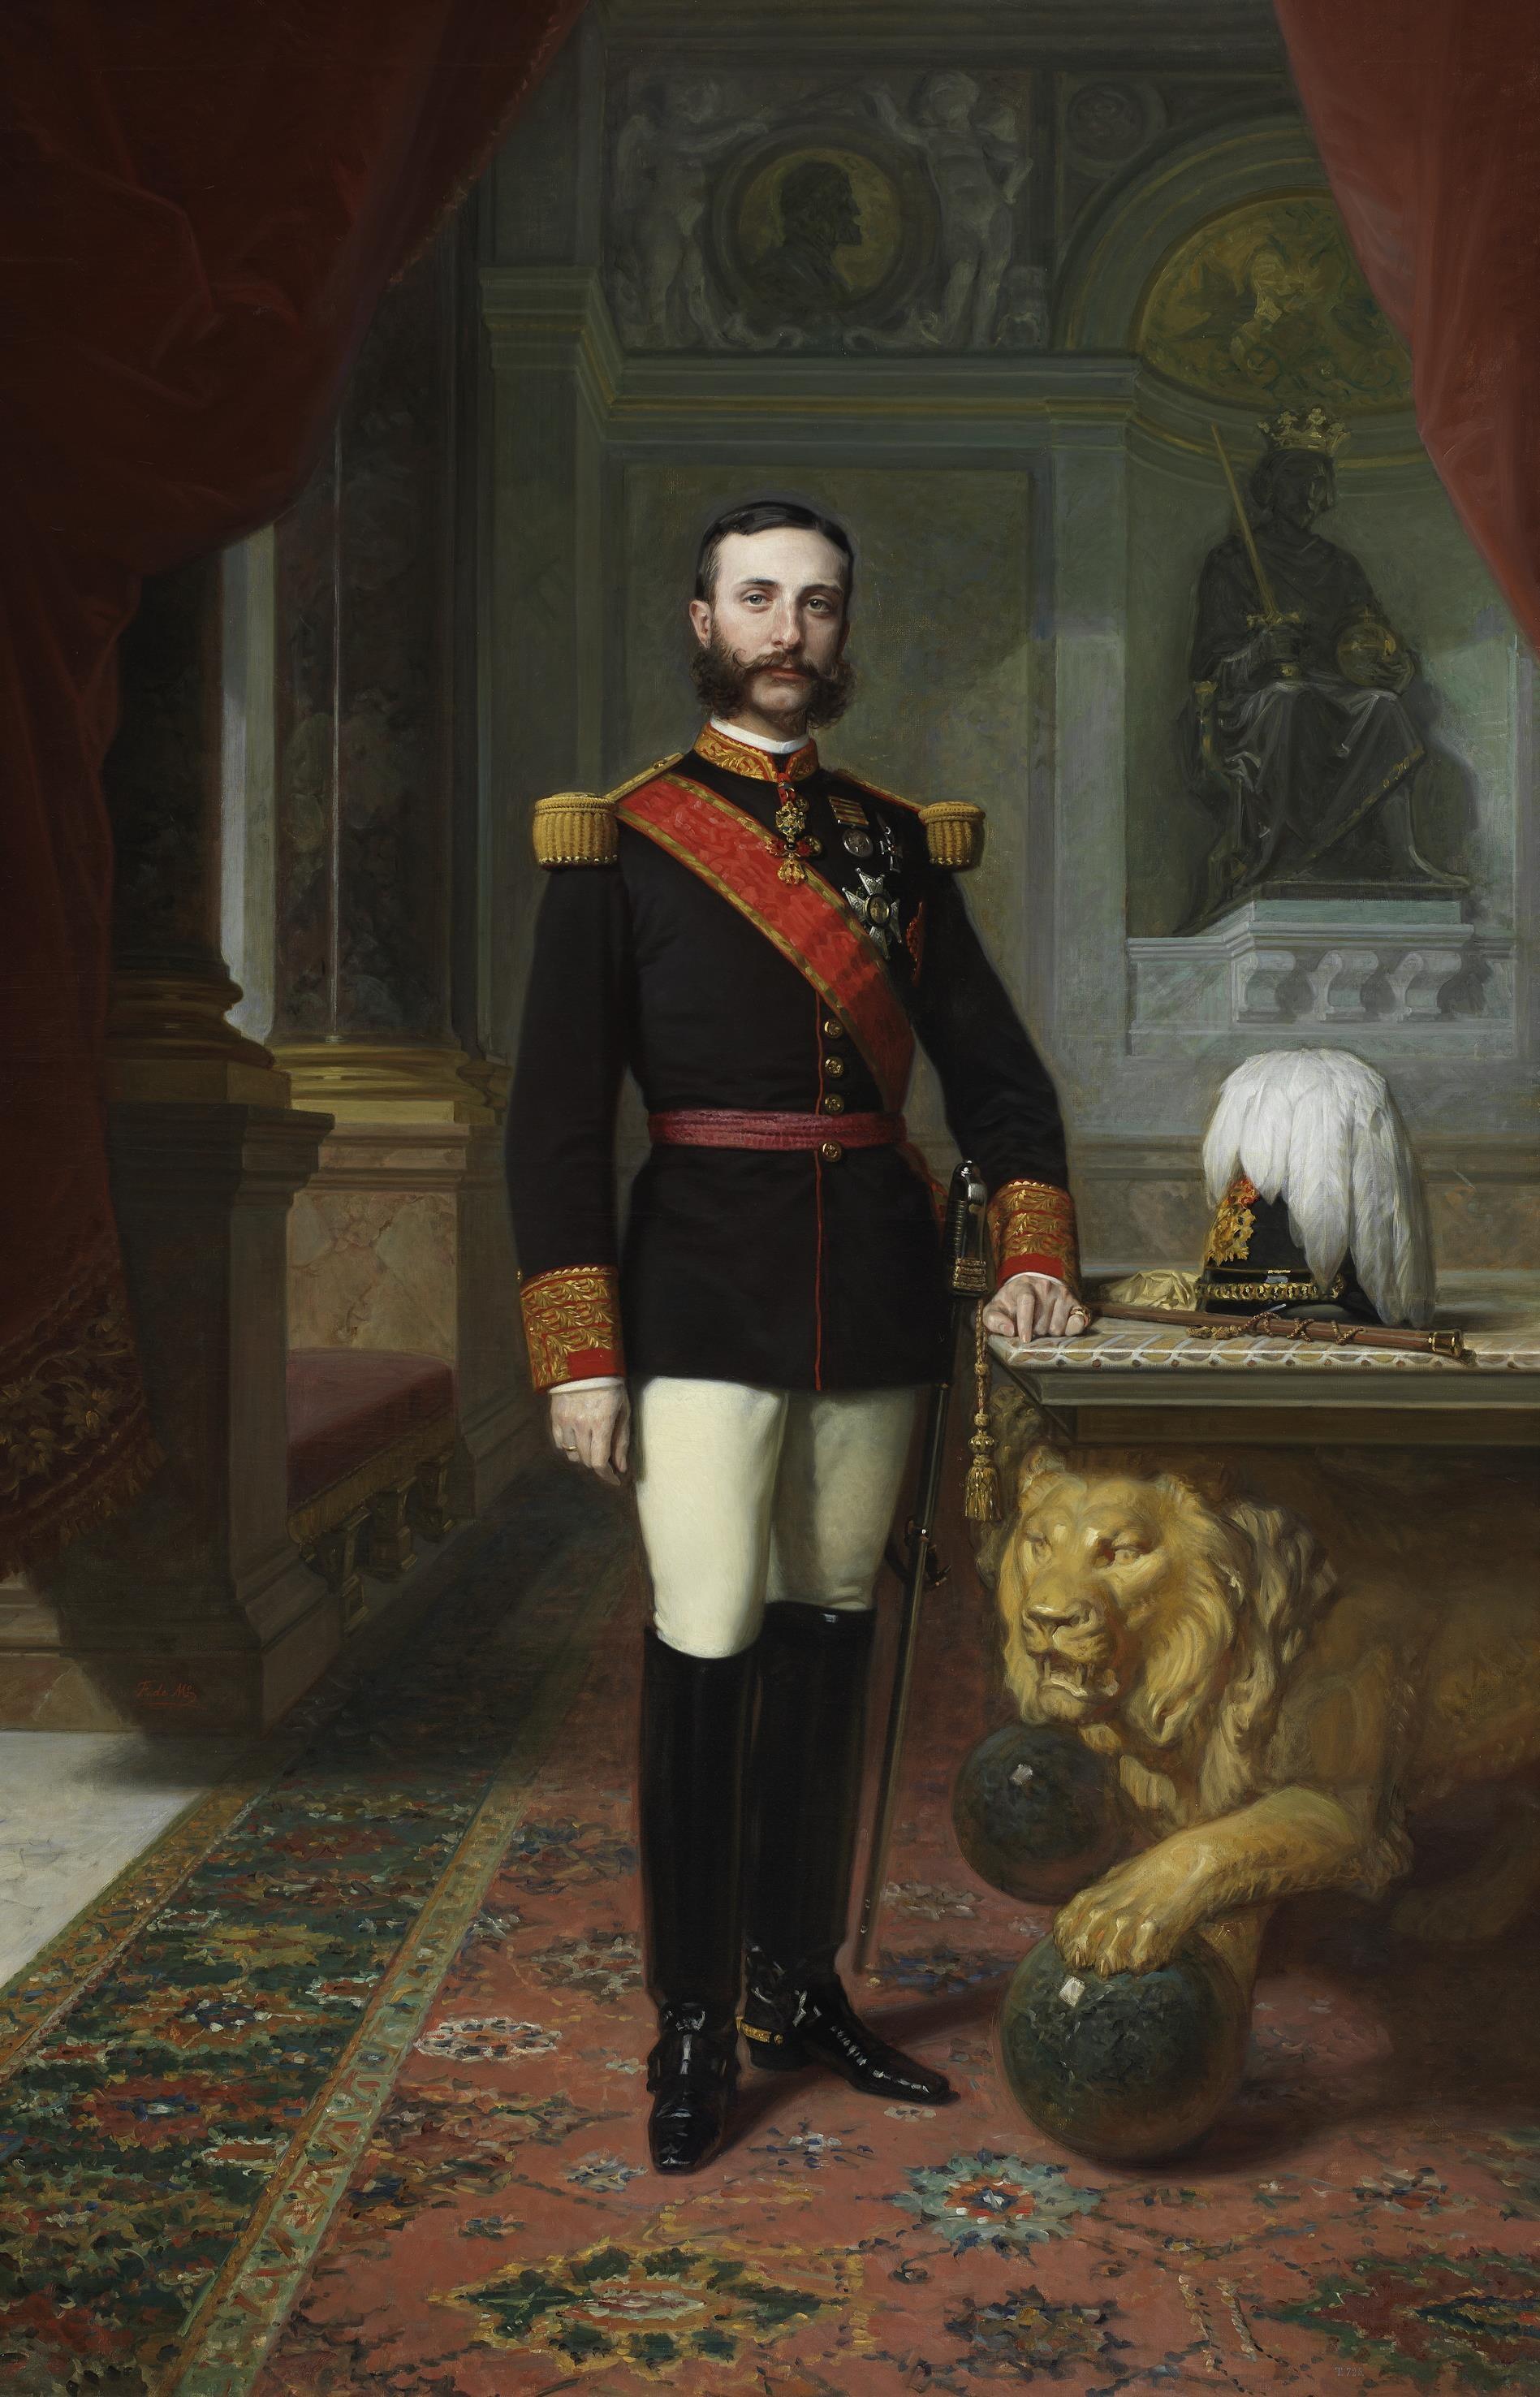 https://upload.wikimedia.org/wikipedia/commons/c/c3/Retrato_del_rey_Alfonso_XII_%28Museo_del_Prado%29.jpg